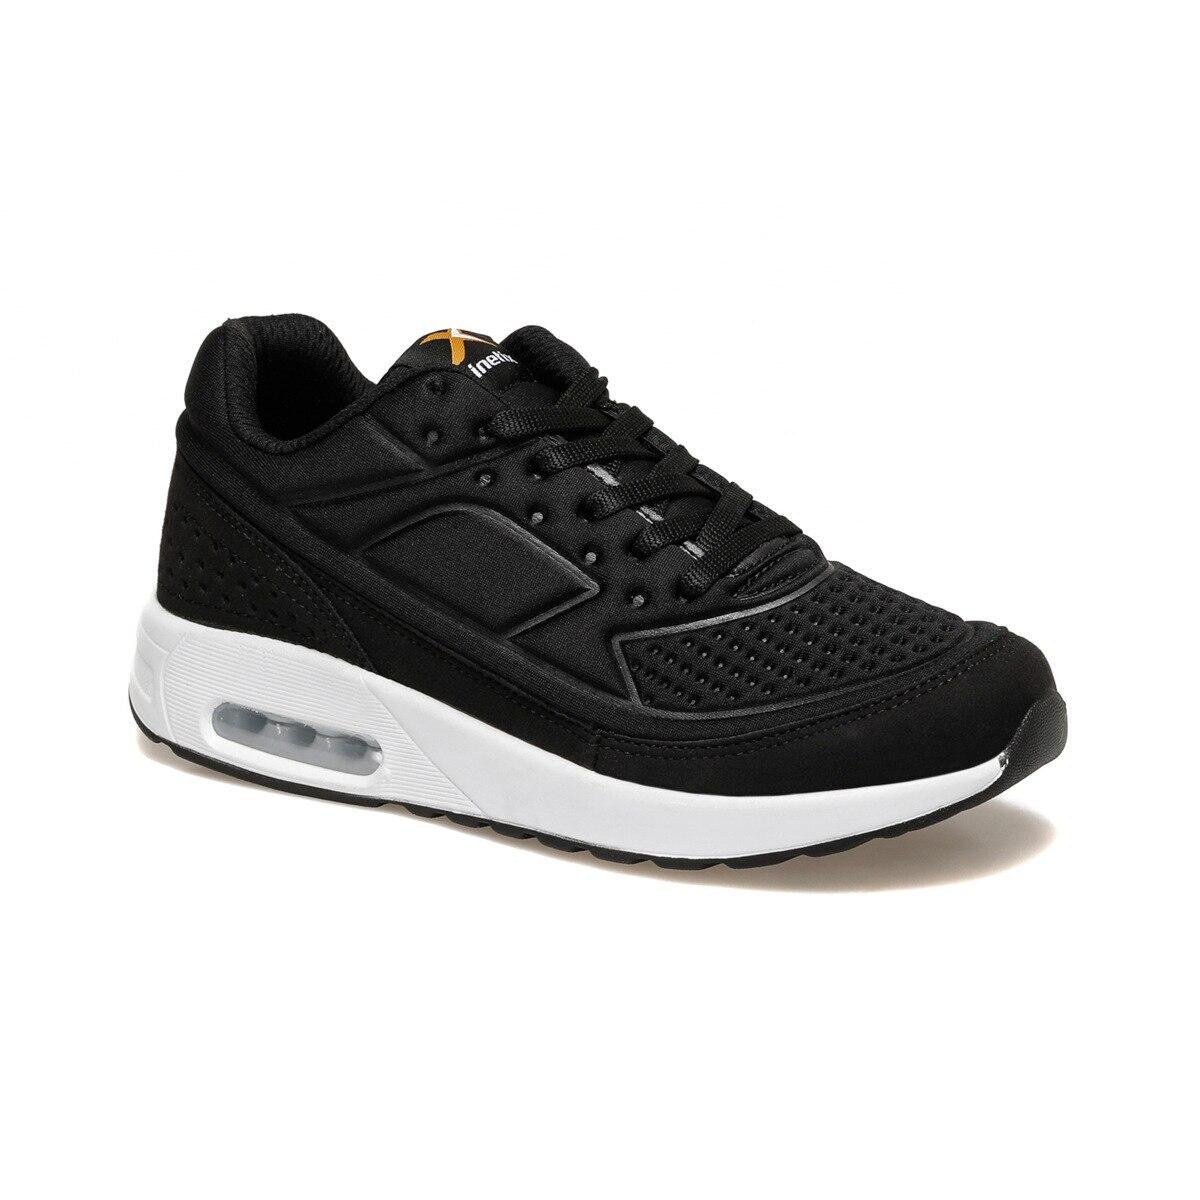 FLO HOGDA W Black Women Shoes KINETIX